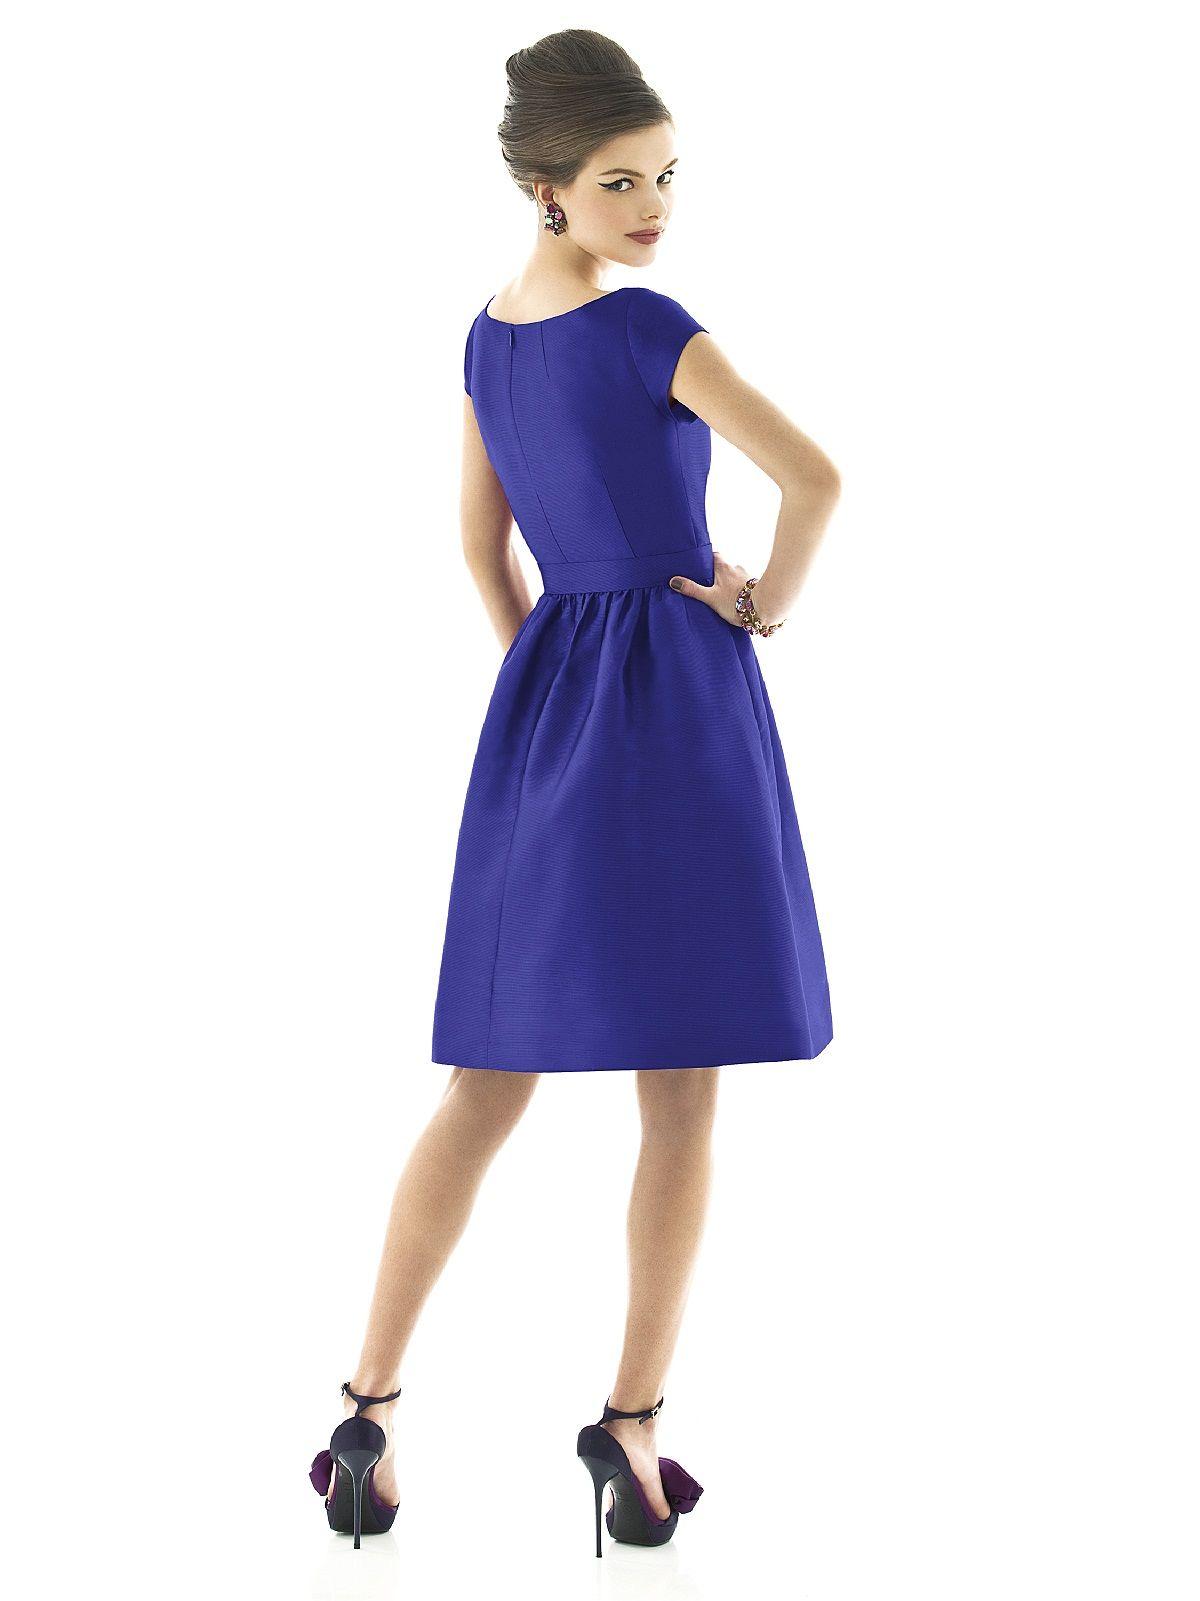 Bridesmaid Dress Option 1 - back